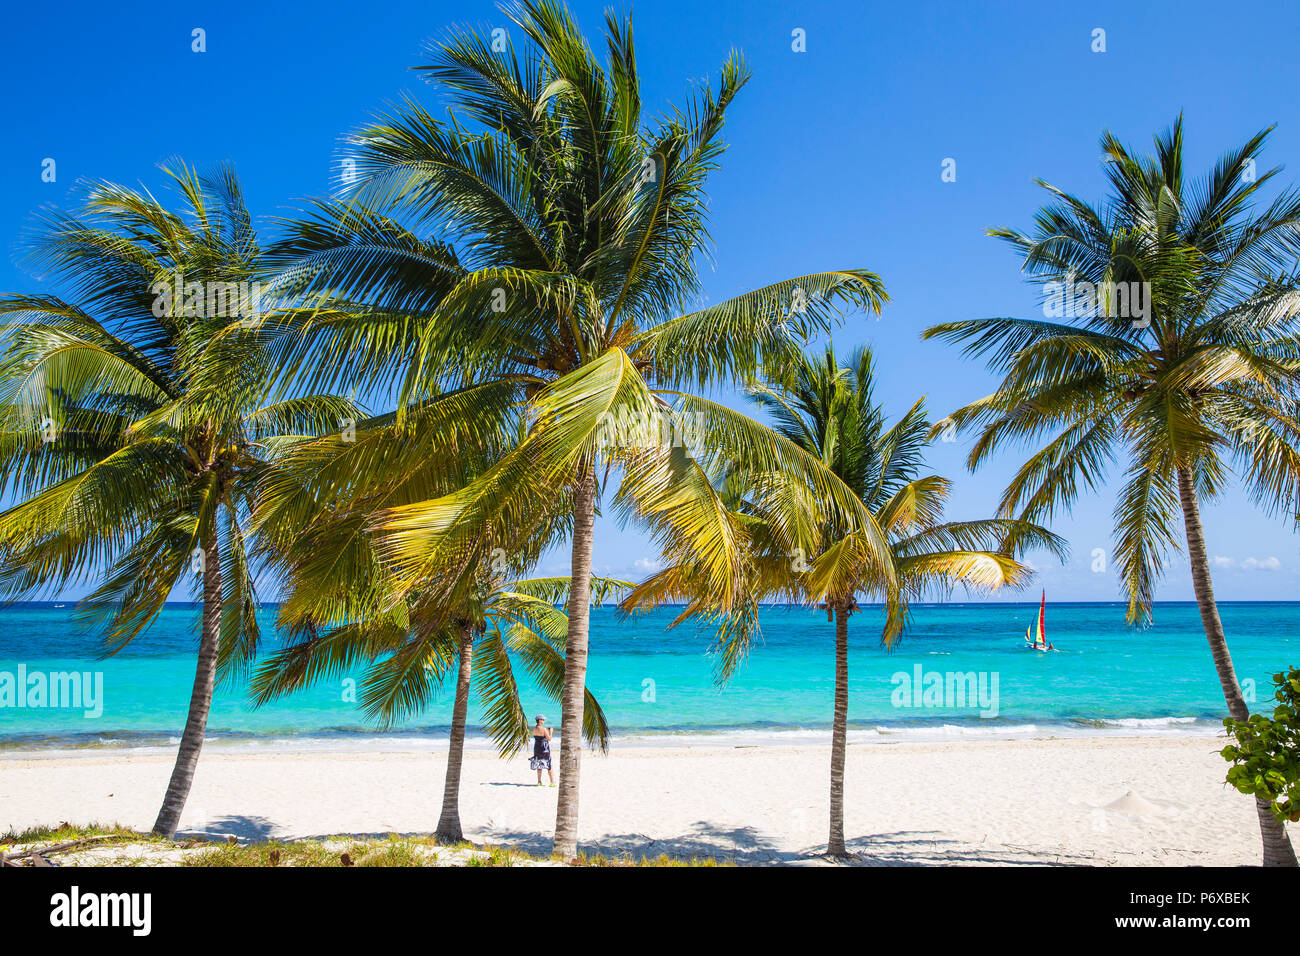 Cuba, Holguin Province, Playa Esmeralda - Stock Image